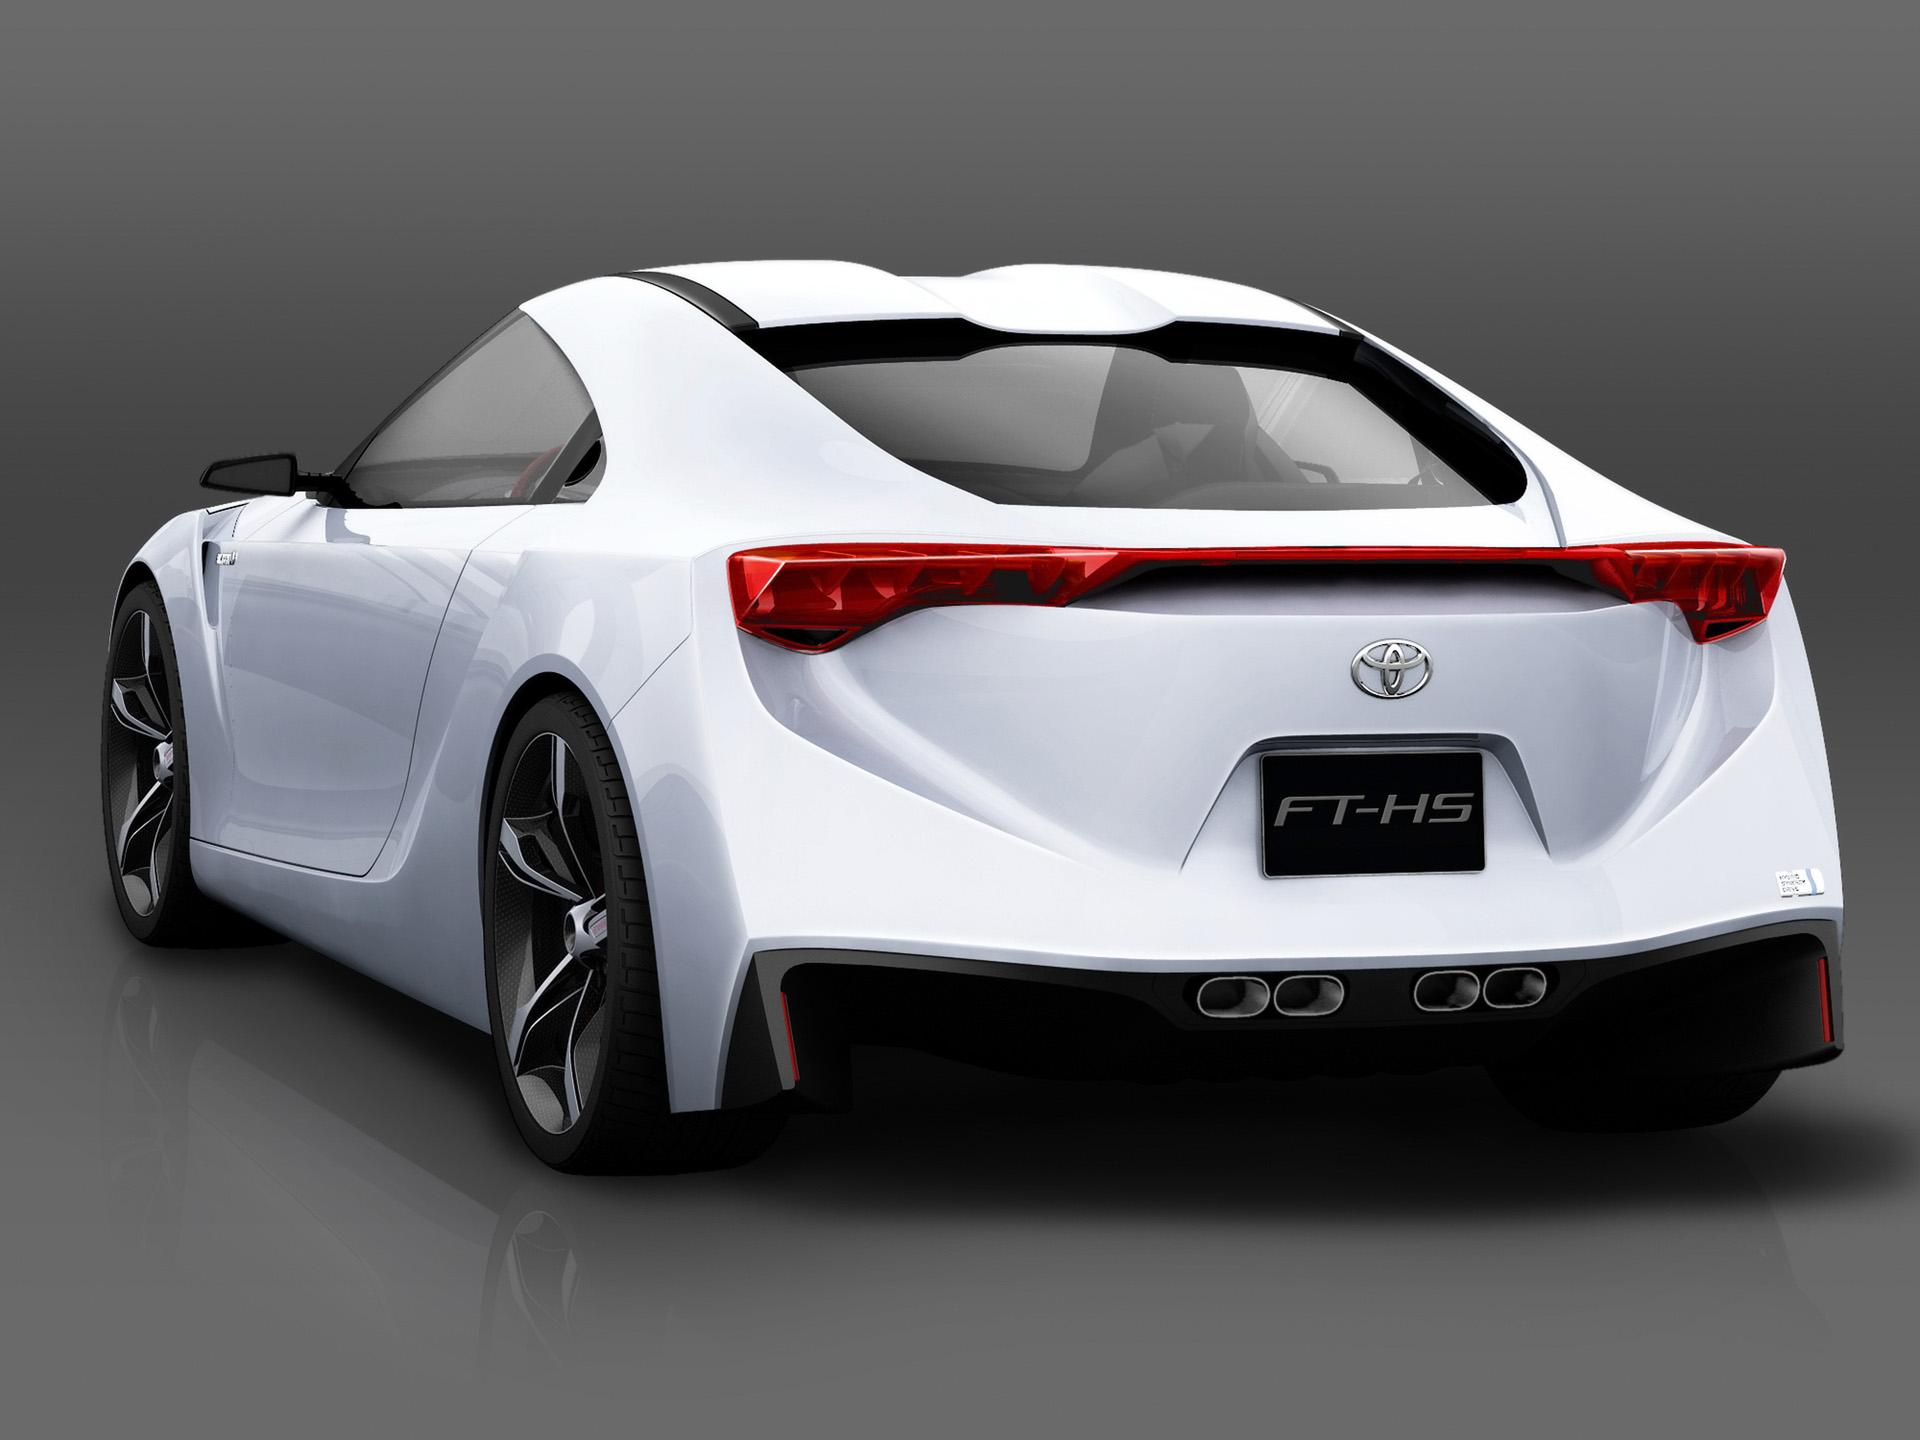 2007 Toyota FT HS Concept Rear Angle Studio Wallpaper Download Wallpaper